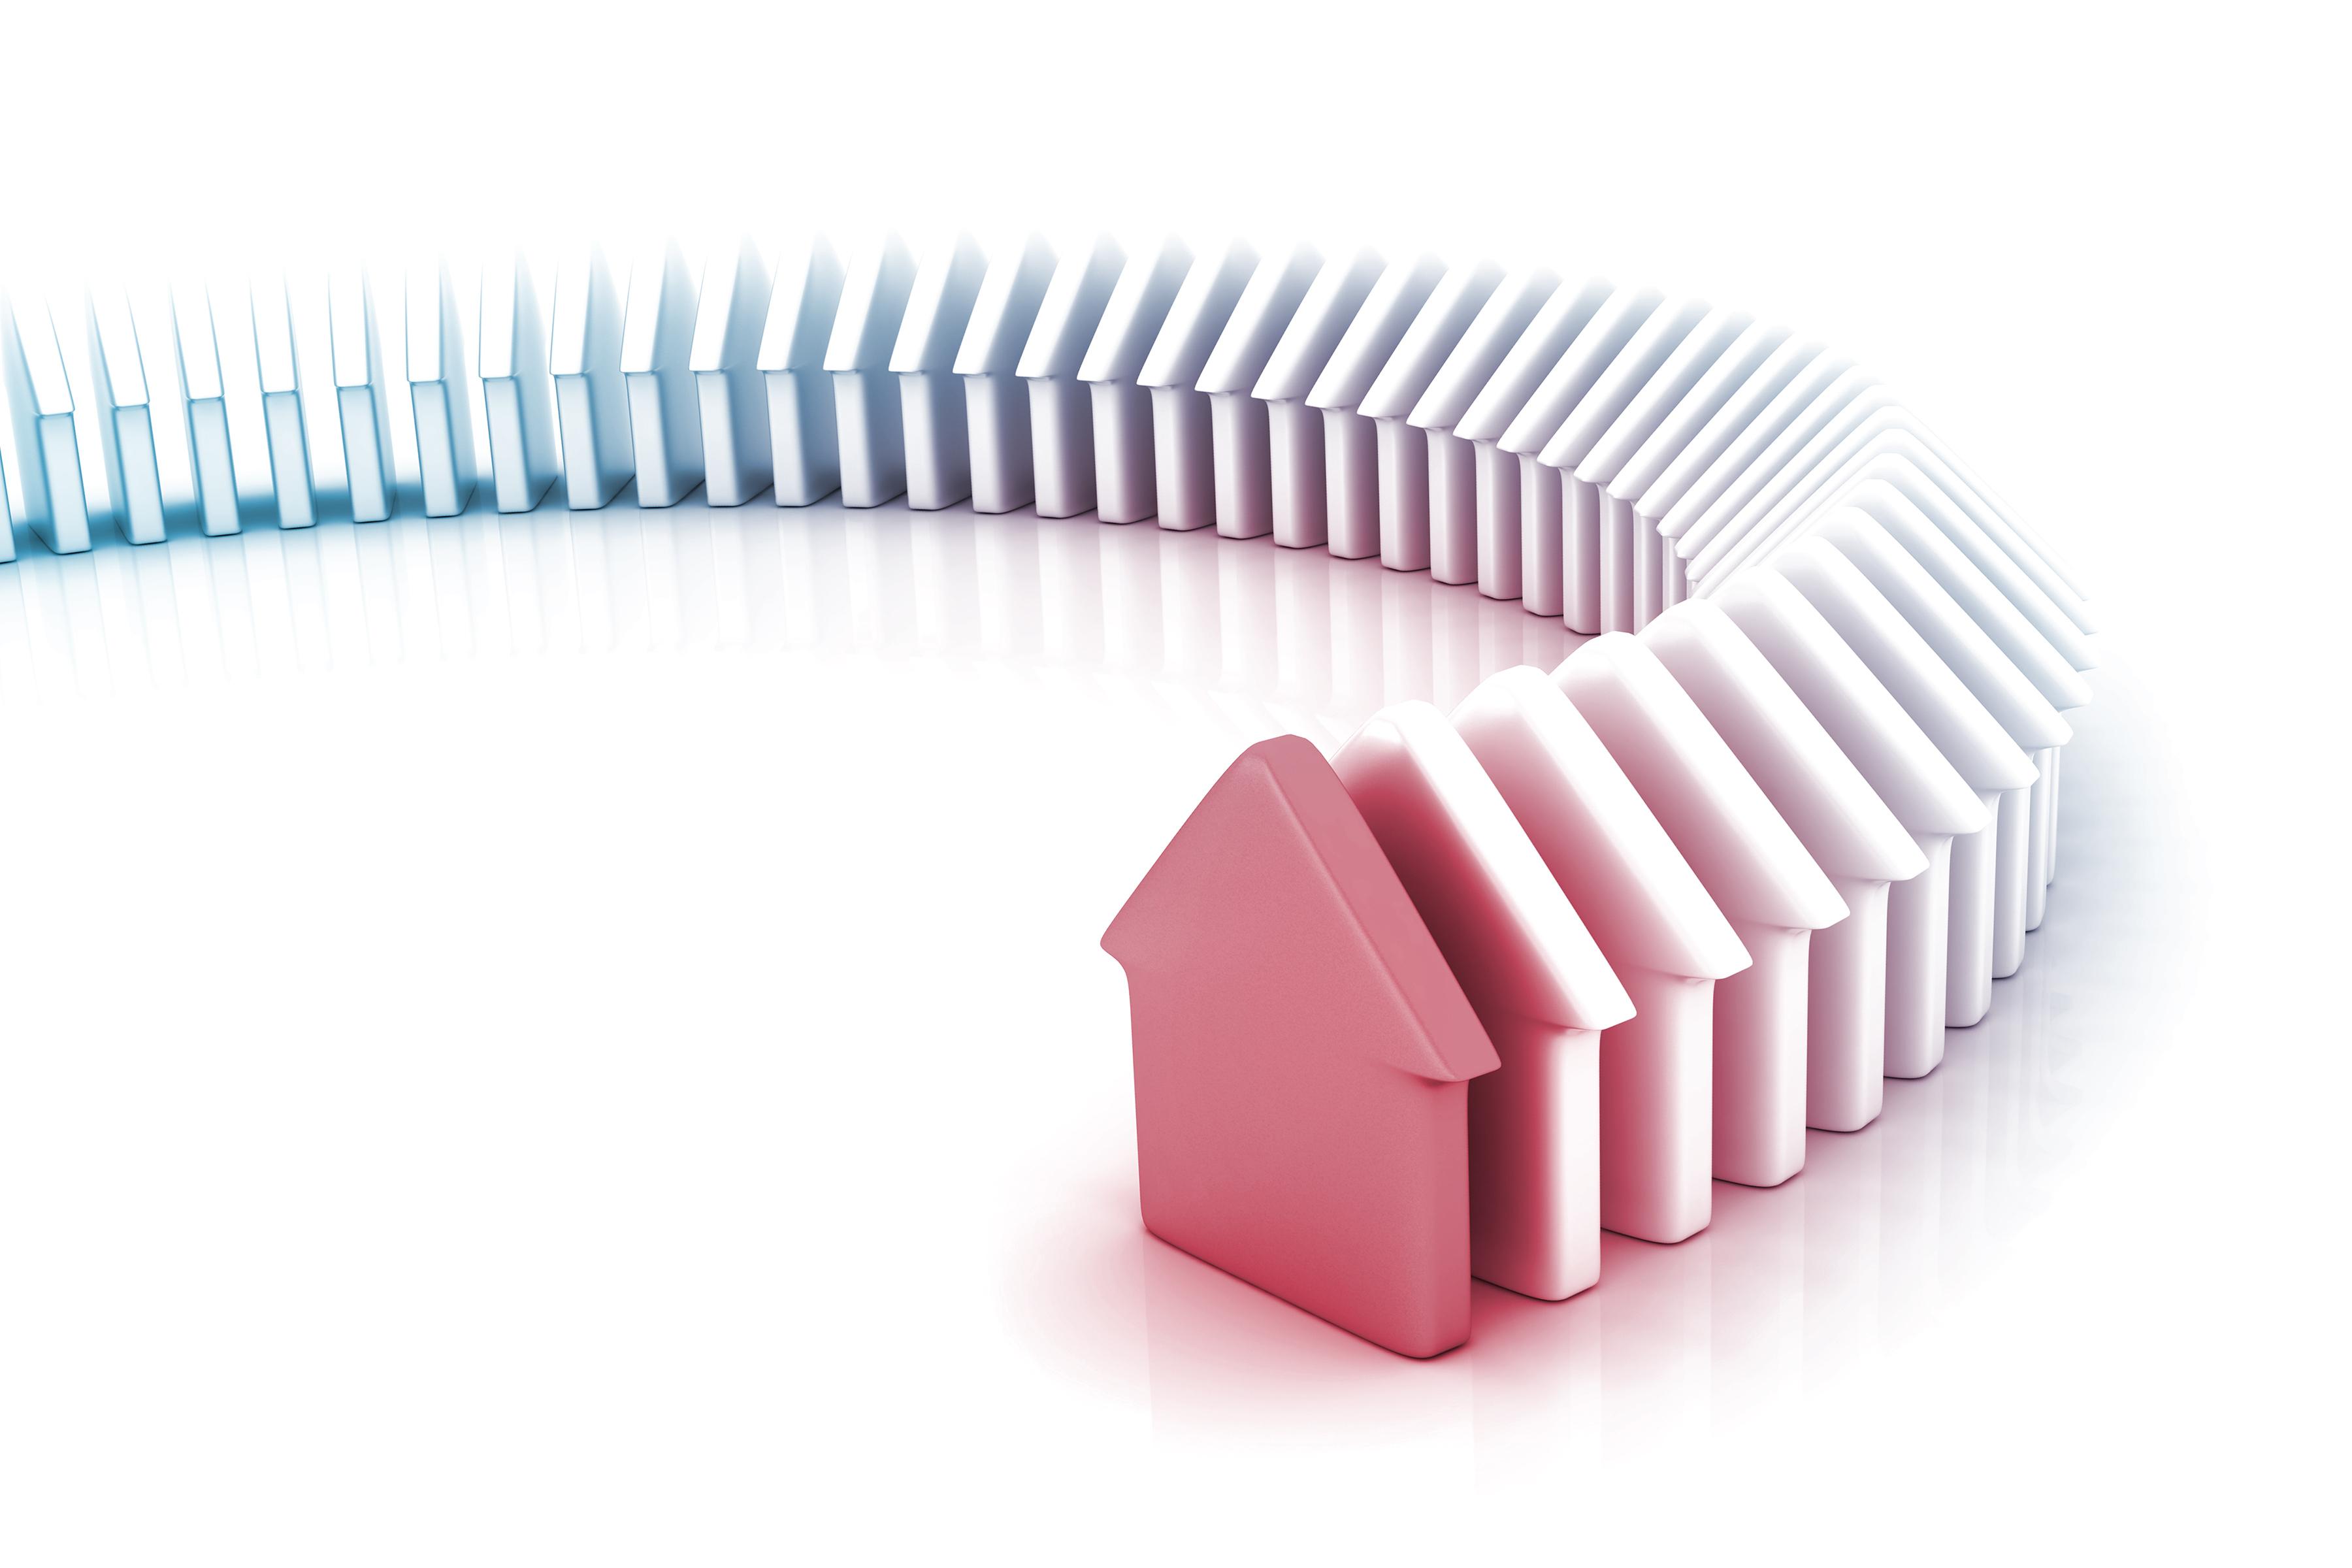 House Market conceptual image.